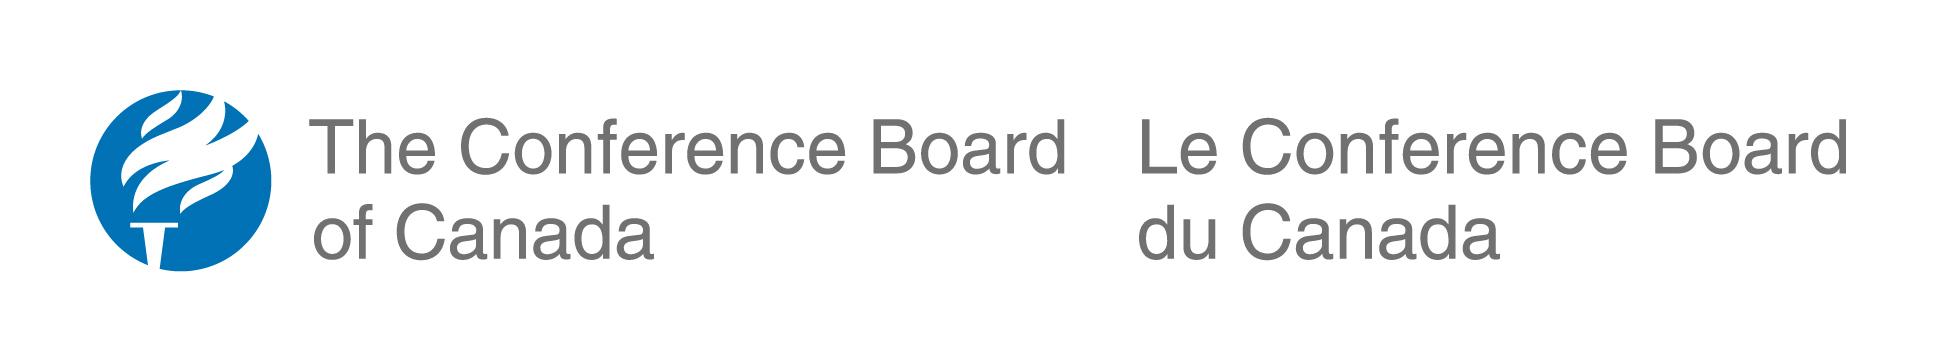 Conference Board of Canada